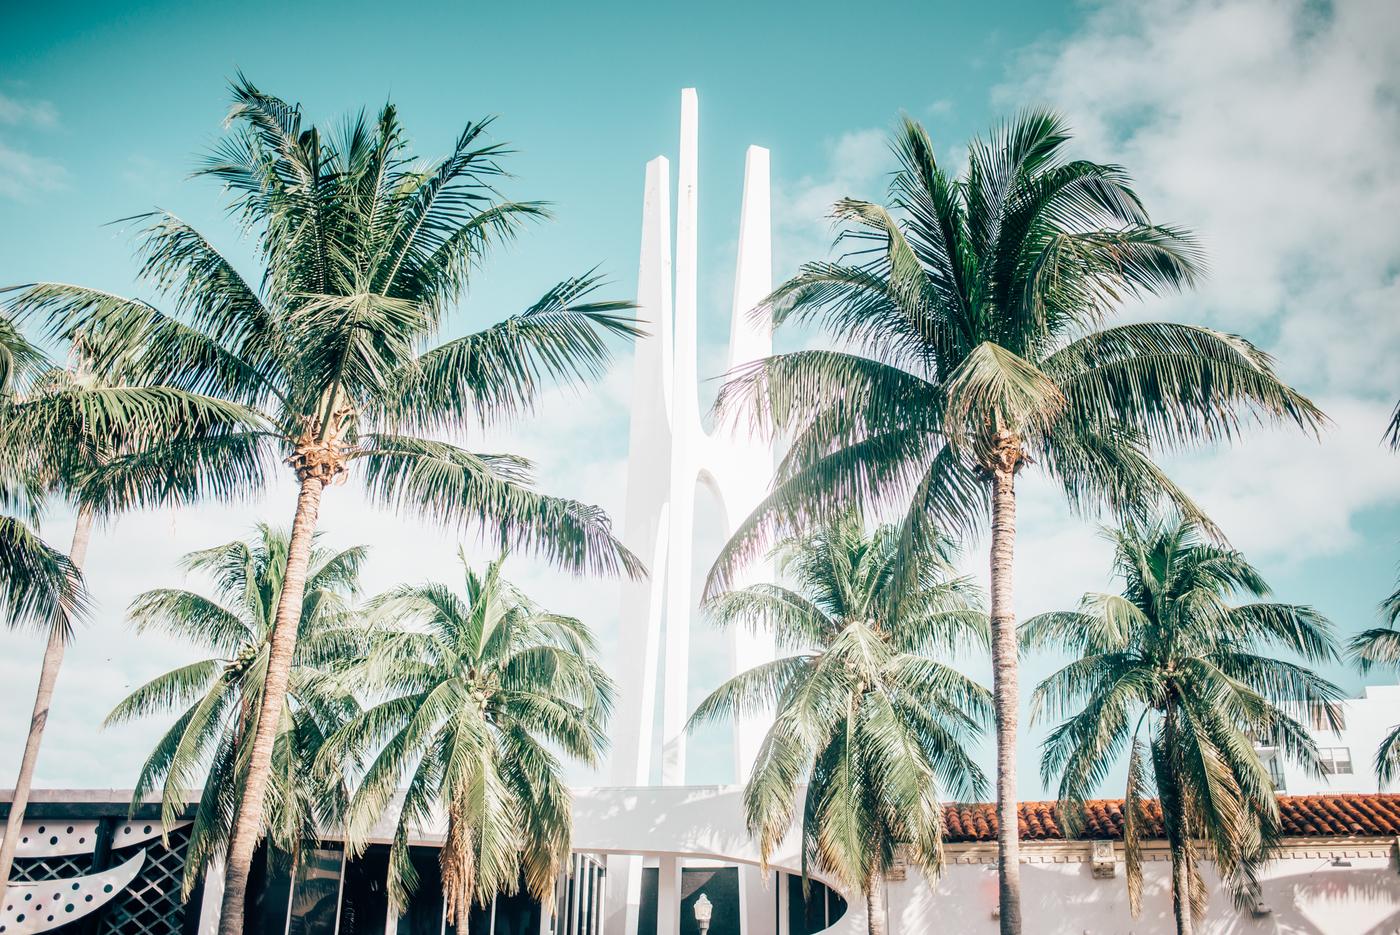 Panama Kaupunki FL dating